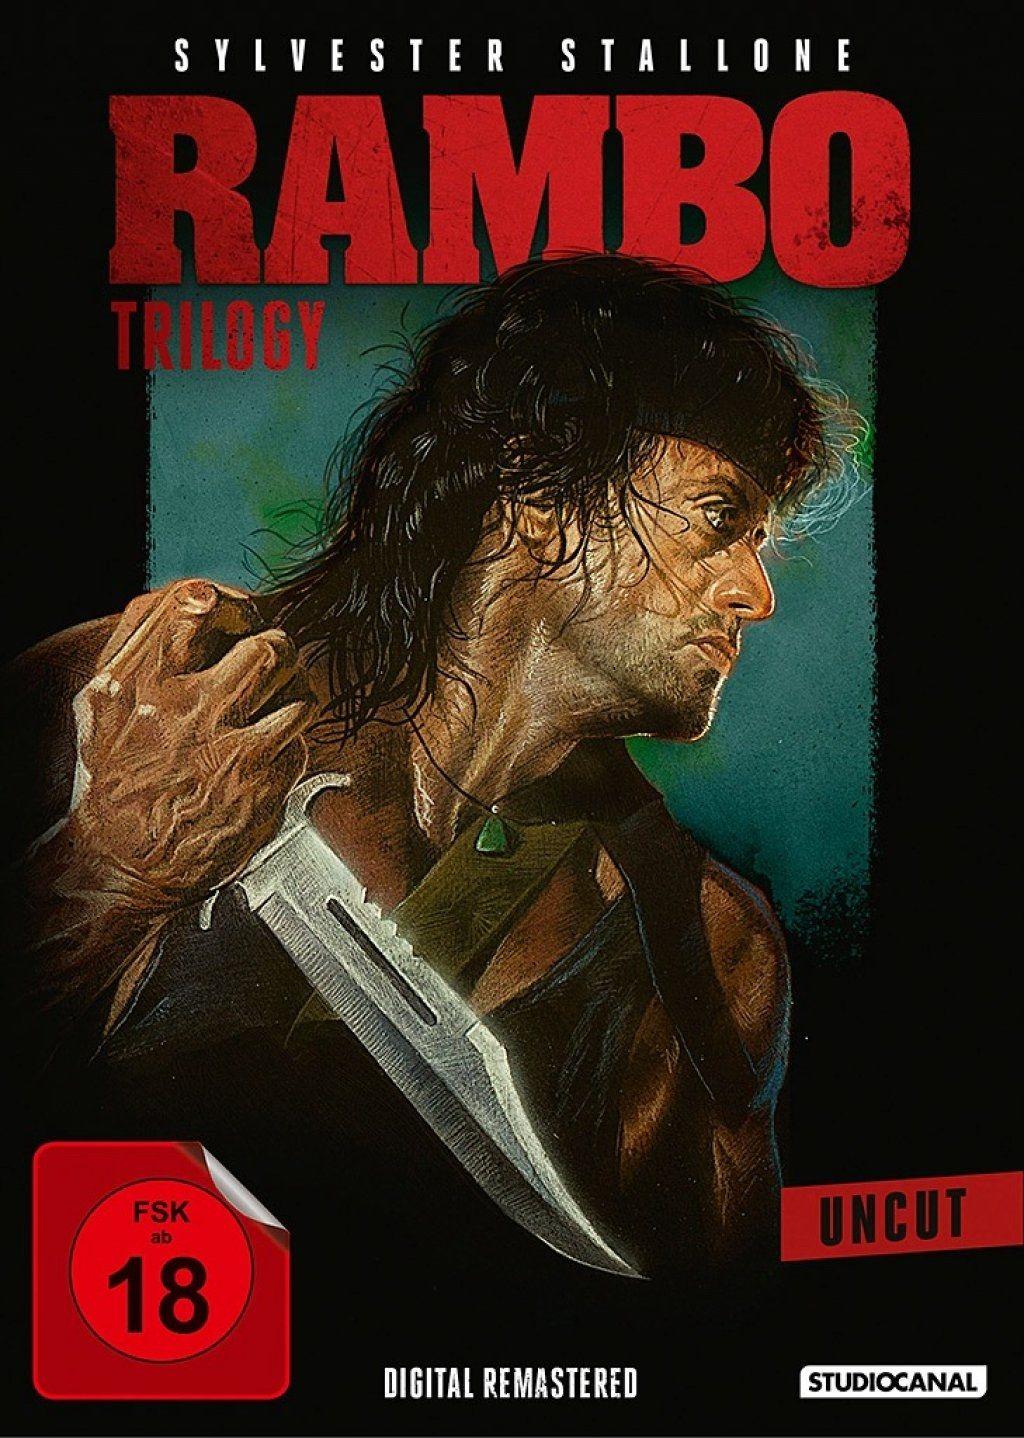 Rambo Trilogy (Uncut) (Digital Remastered) (3 Discs)